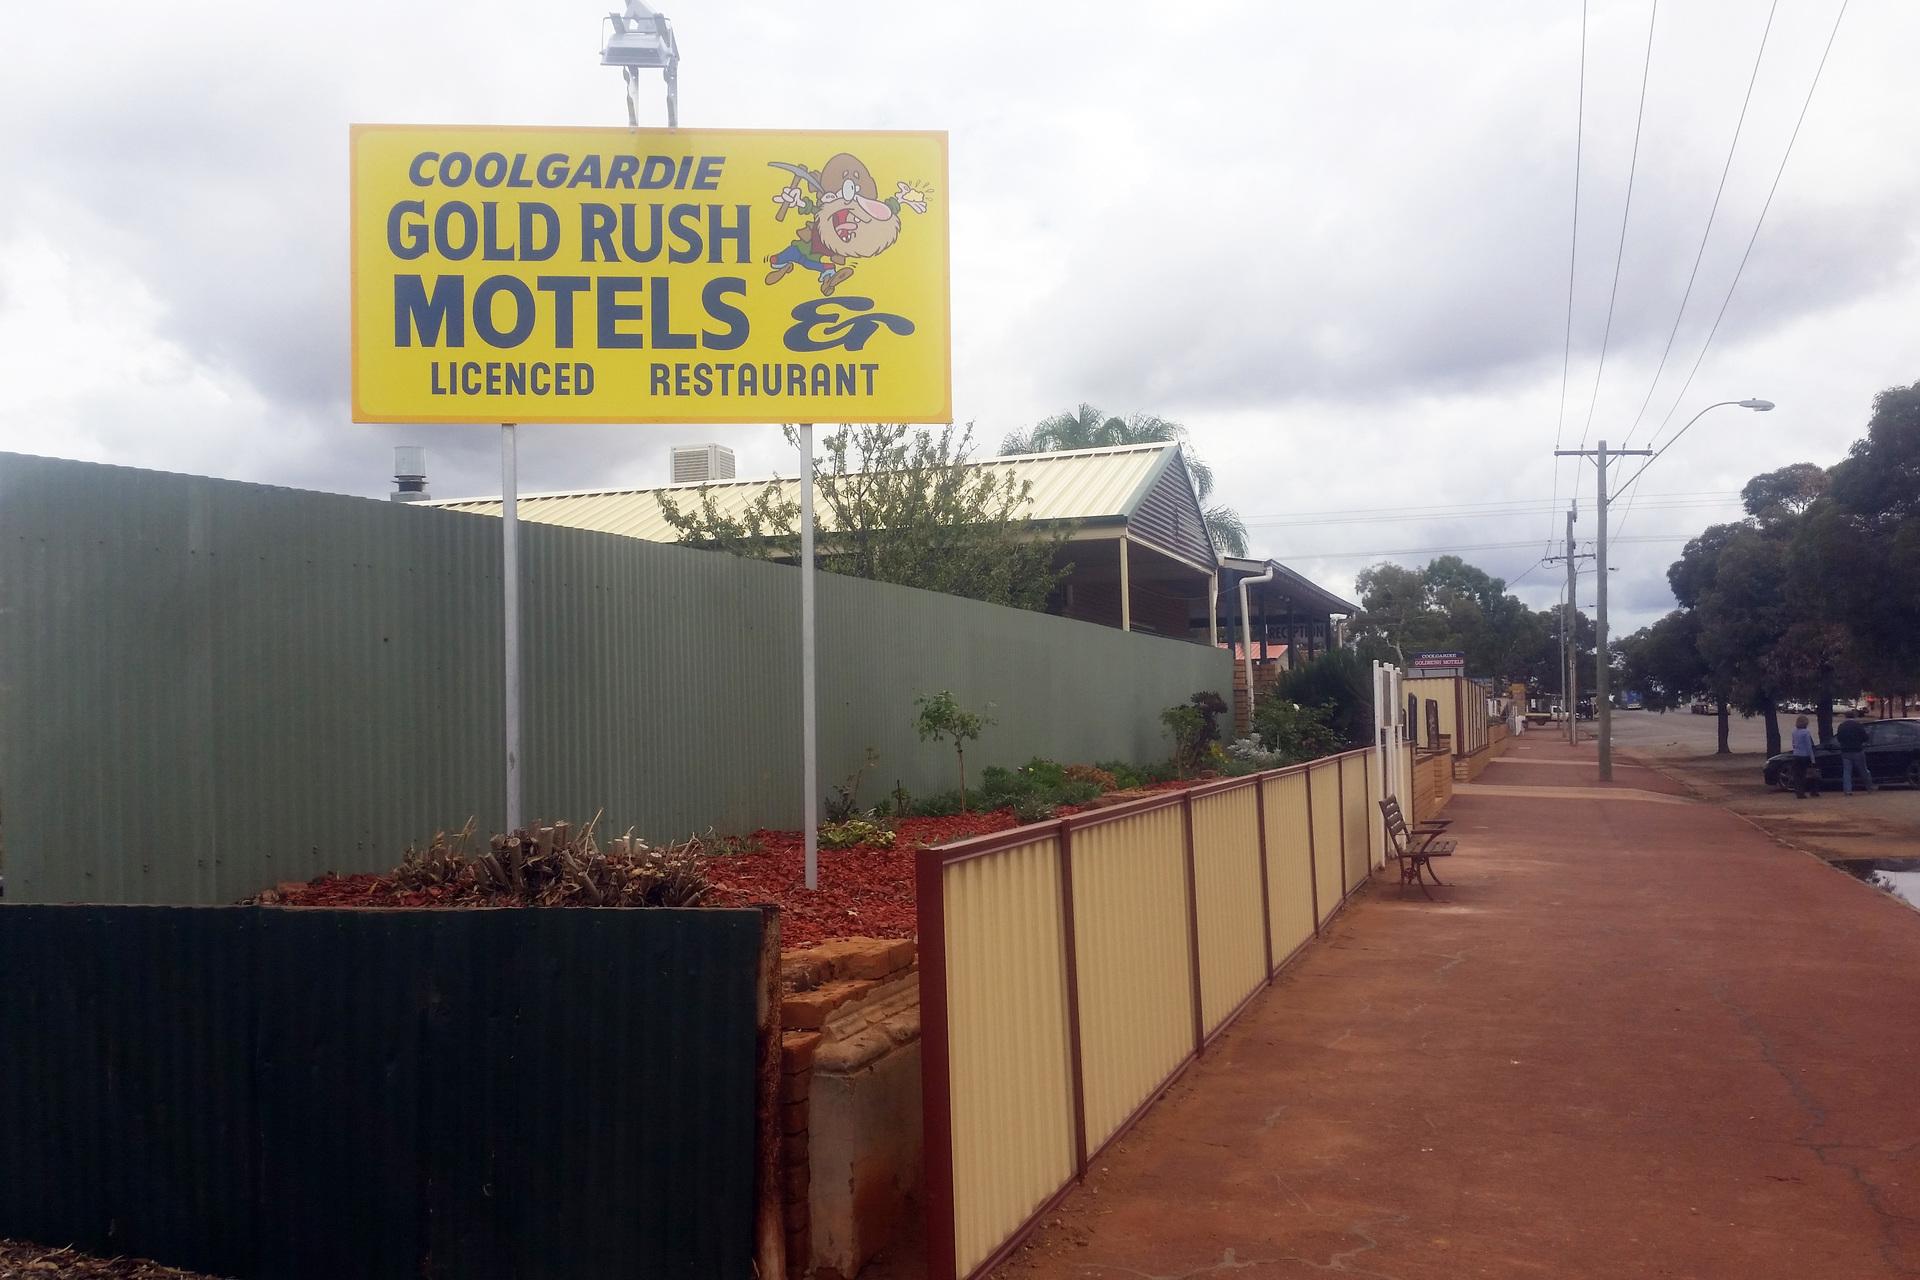 h - Coolgardie Gold Rush Motels